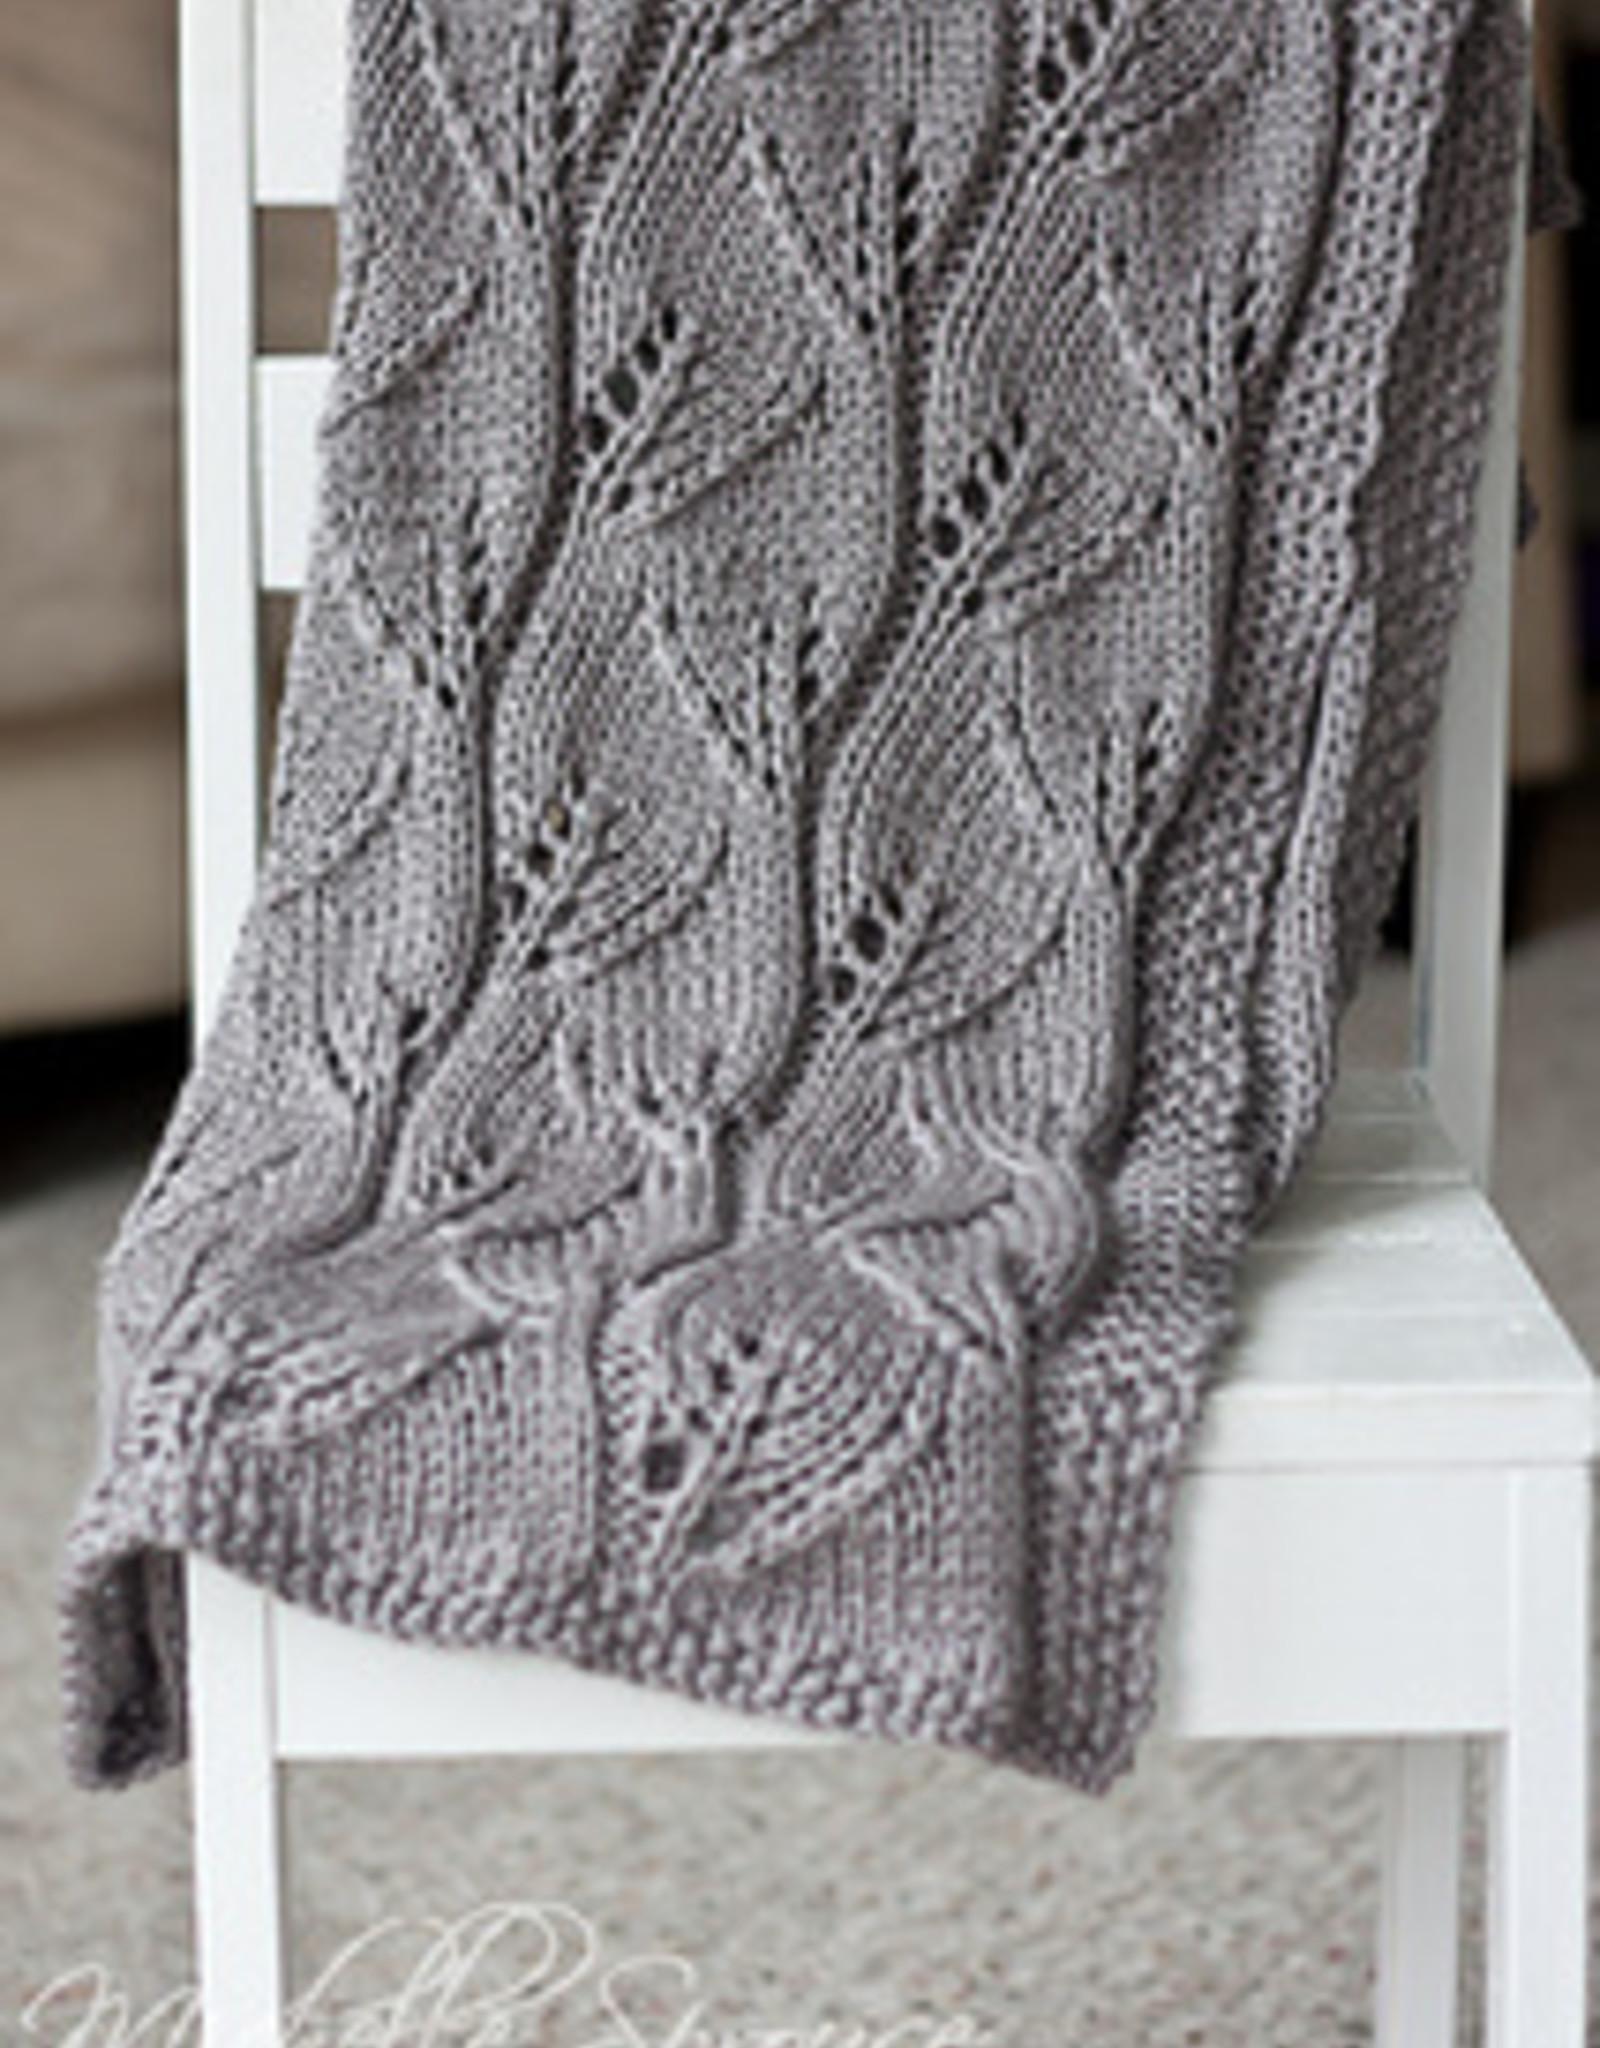 Pelotes & Cie Prêt-à-tricoter -Leafy baby blanket - Dried plum